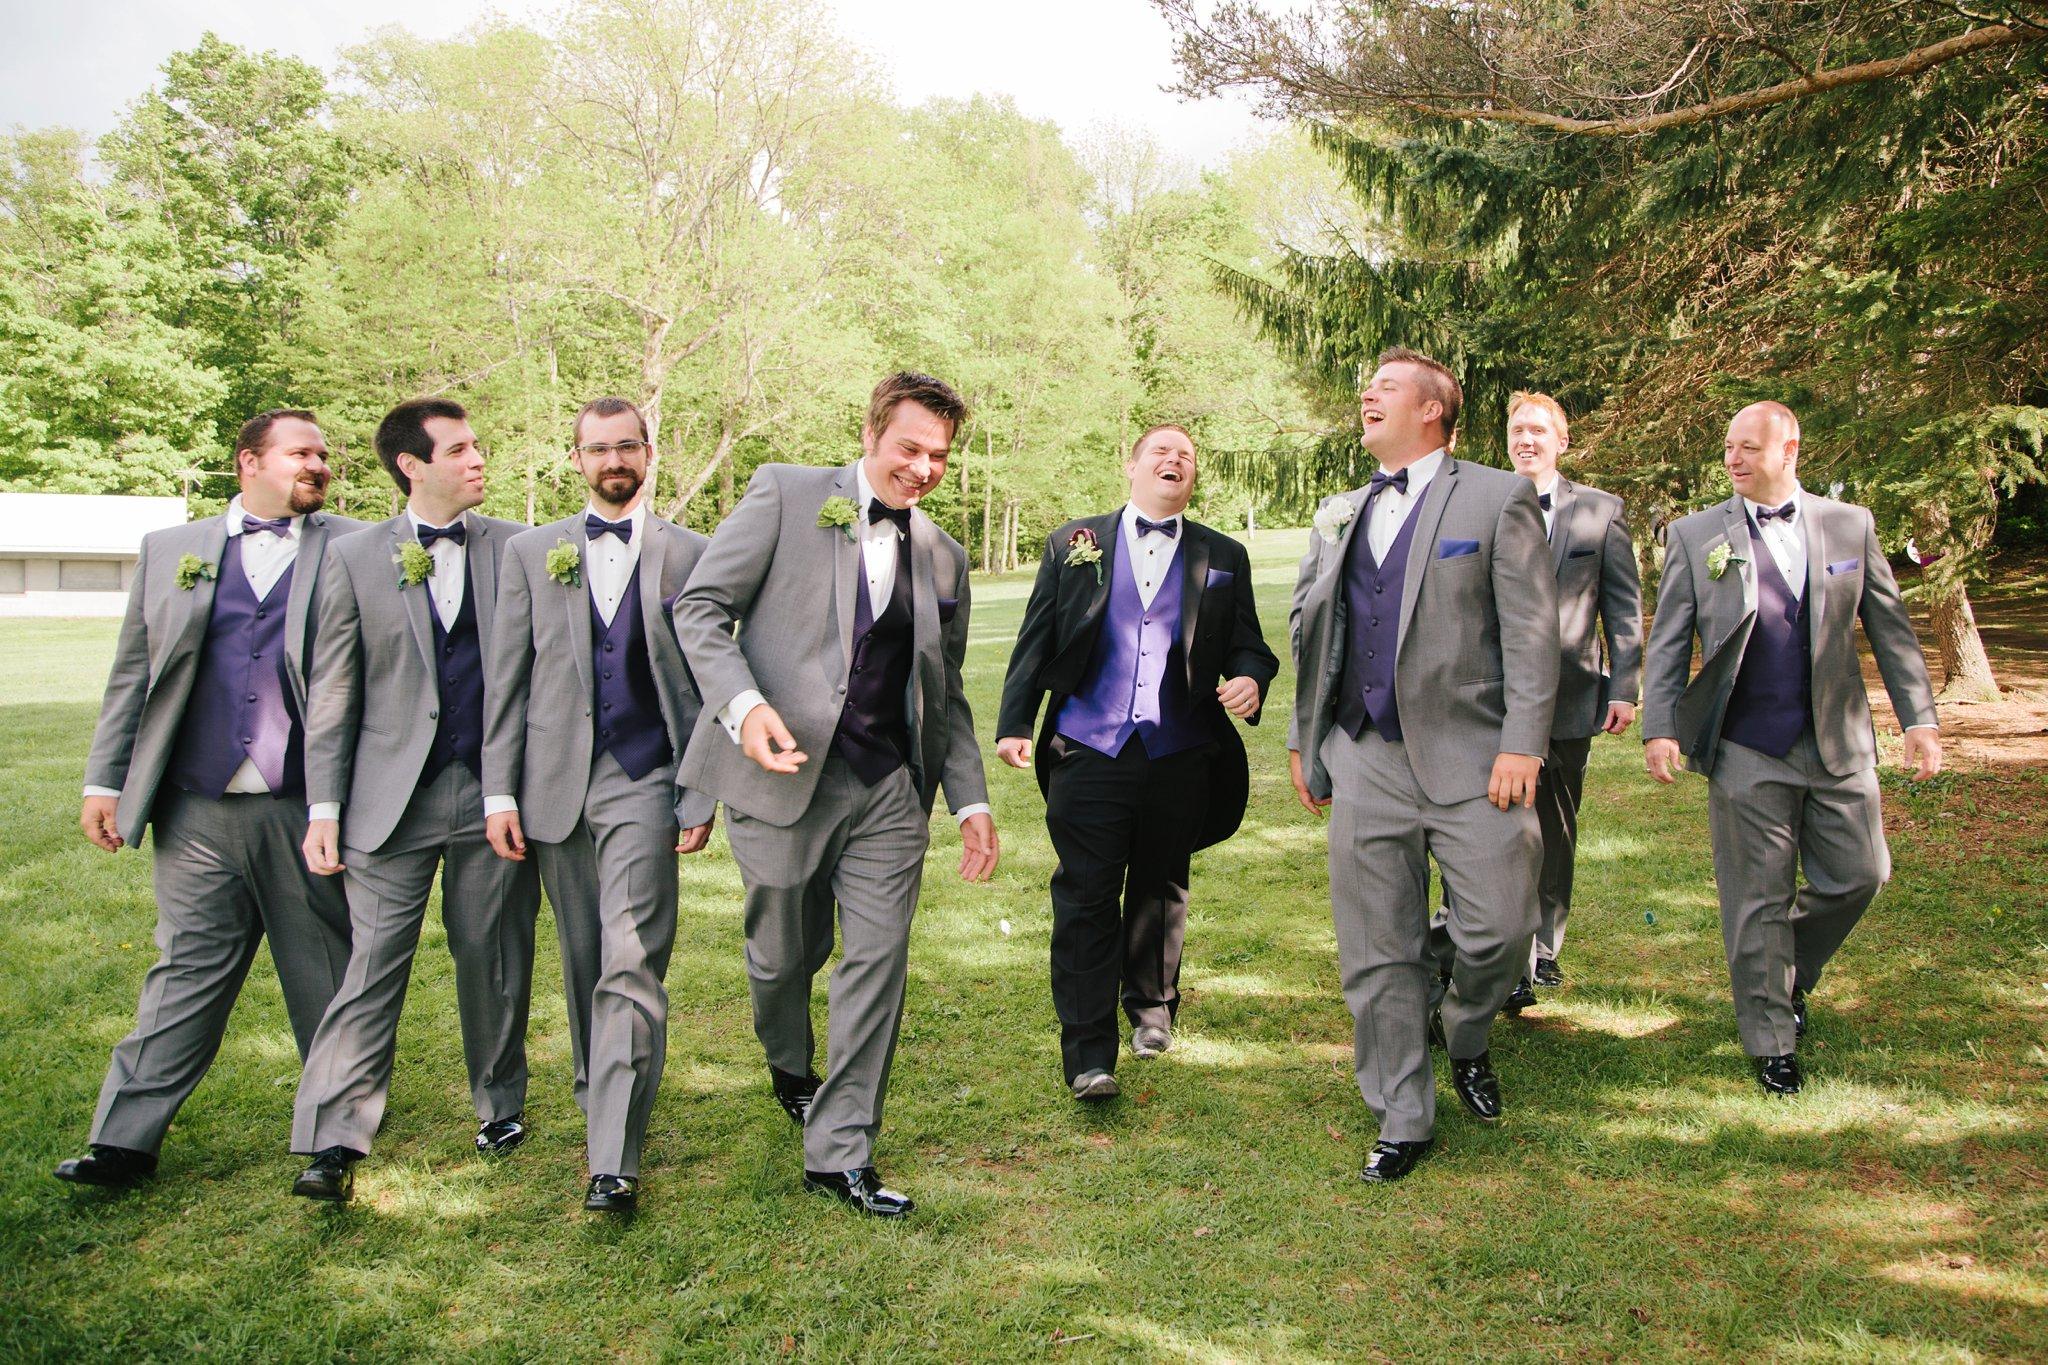 montdale_country_club_wedding_photos_photographer_scranton_pa6915.jpg